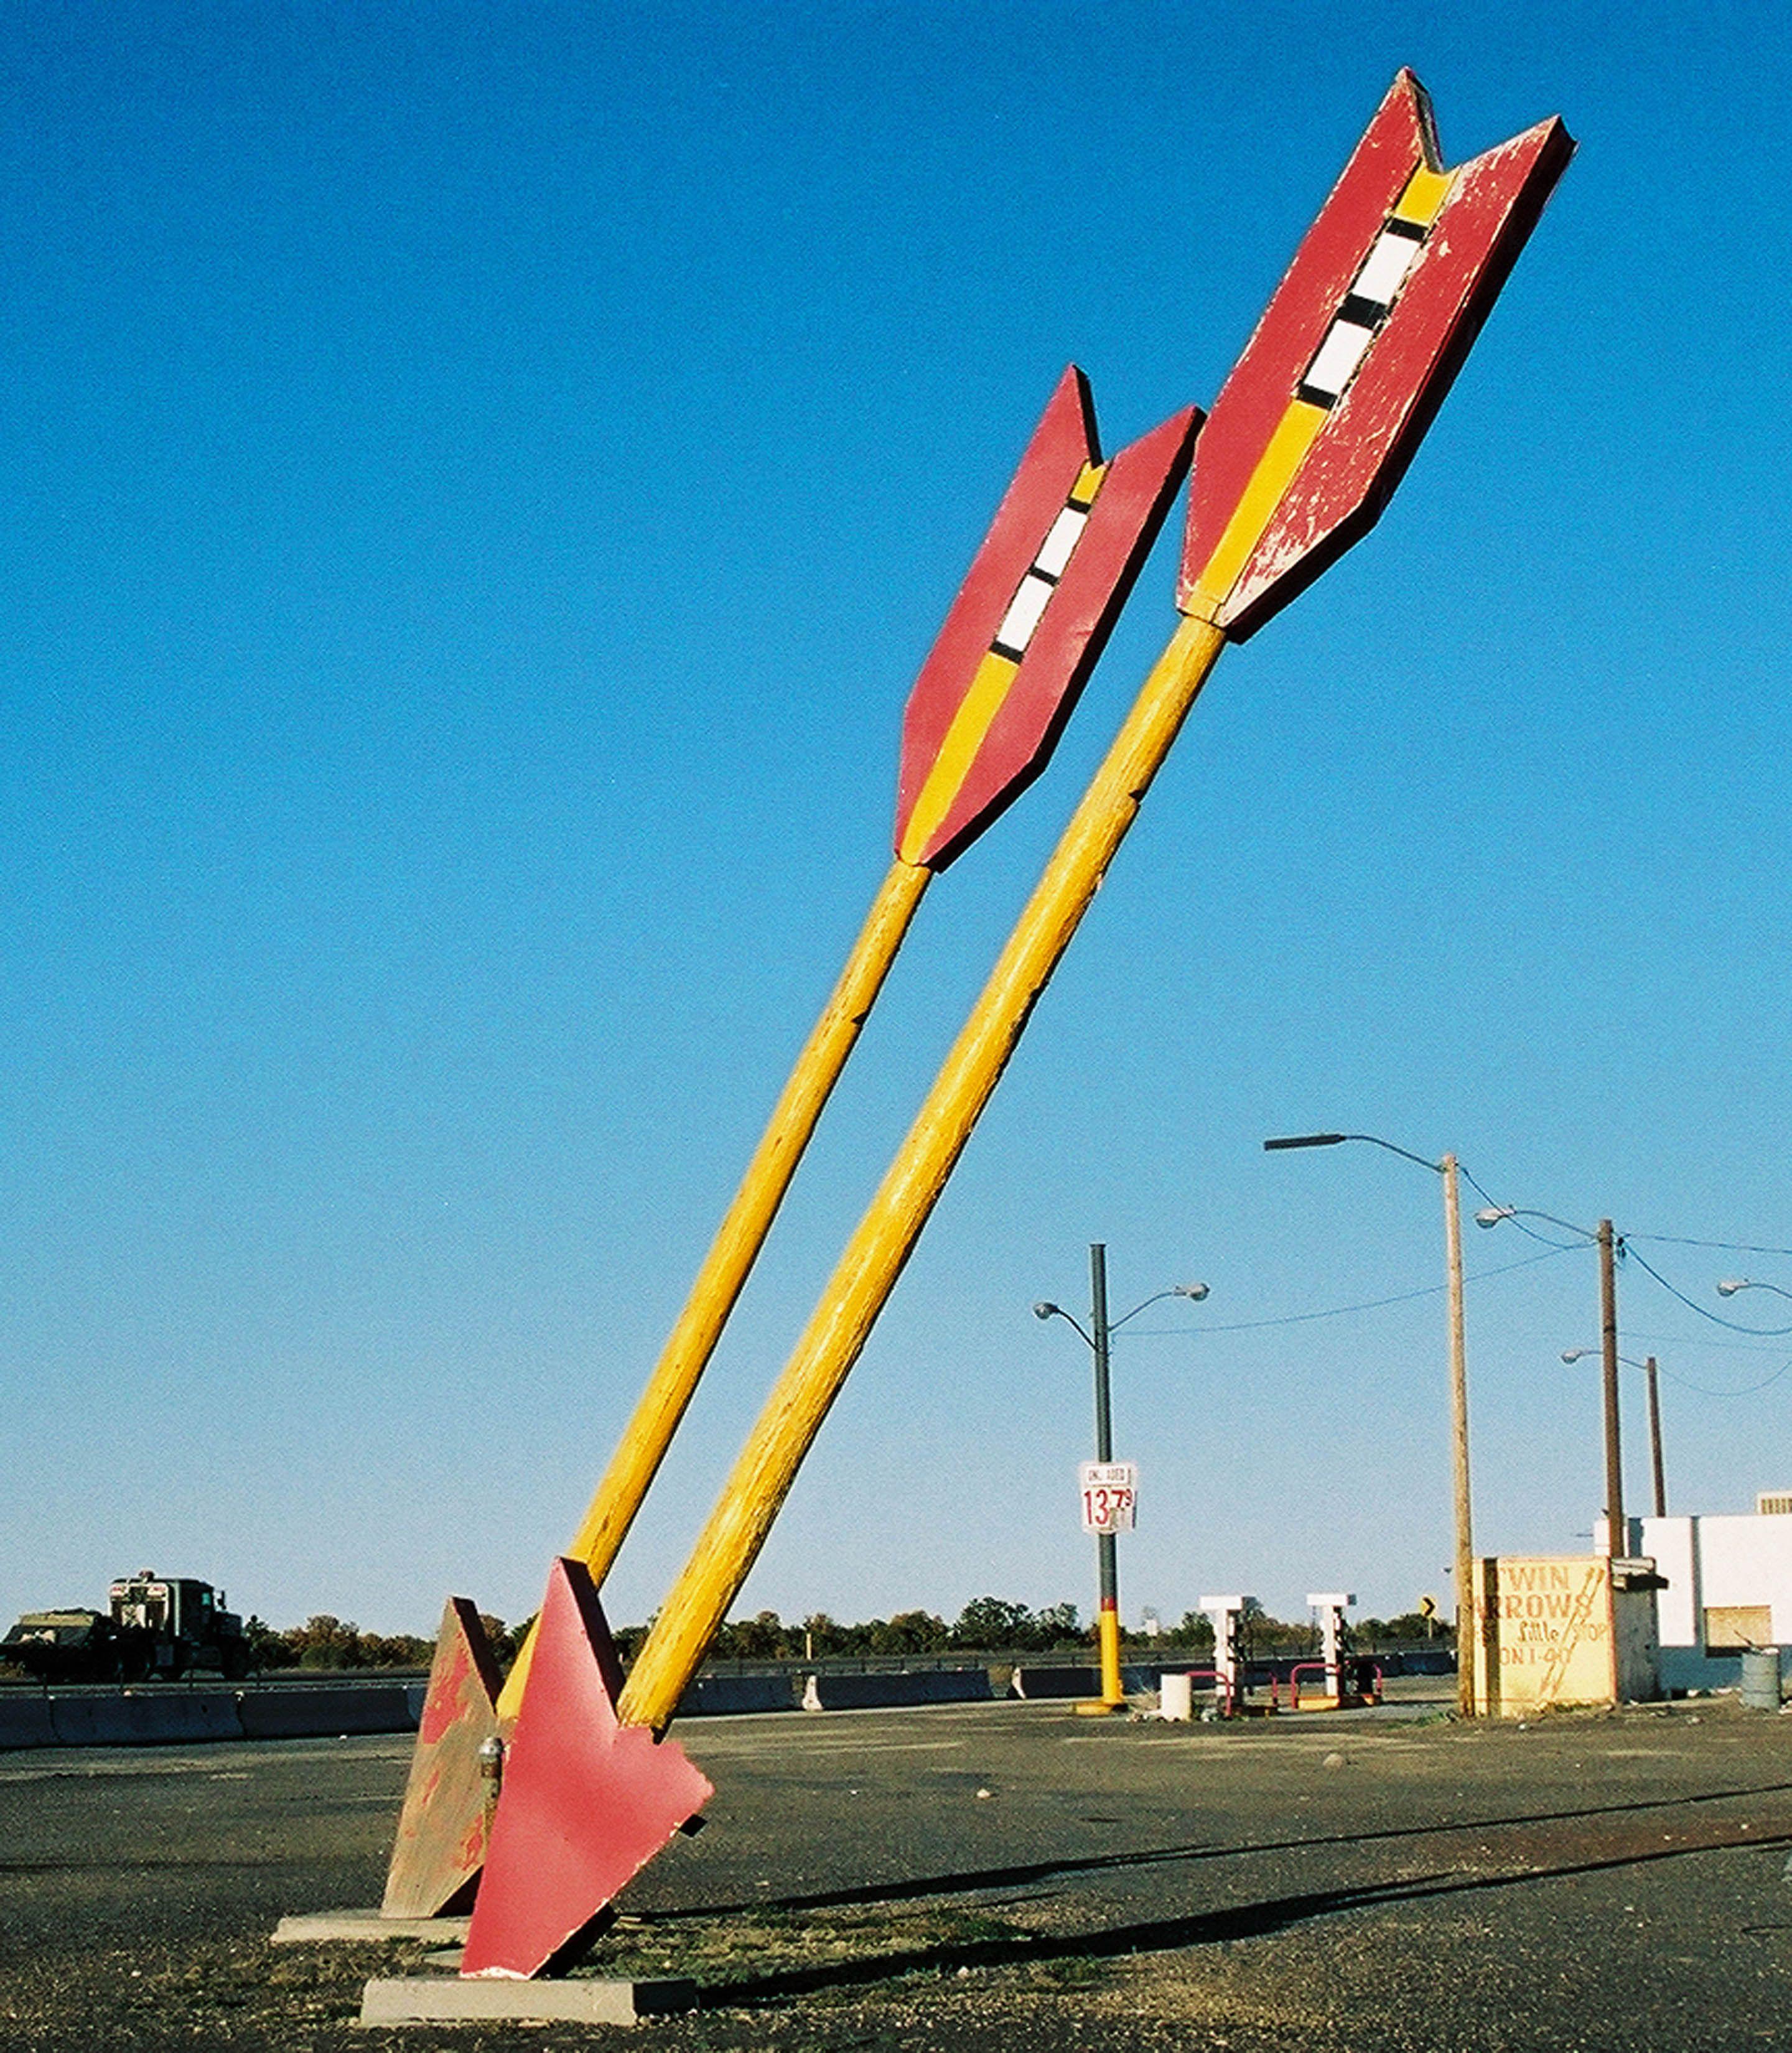 route 66 arrows - Google Search